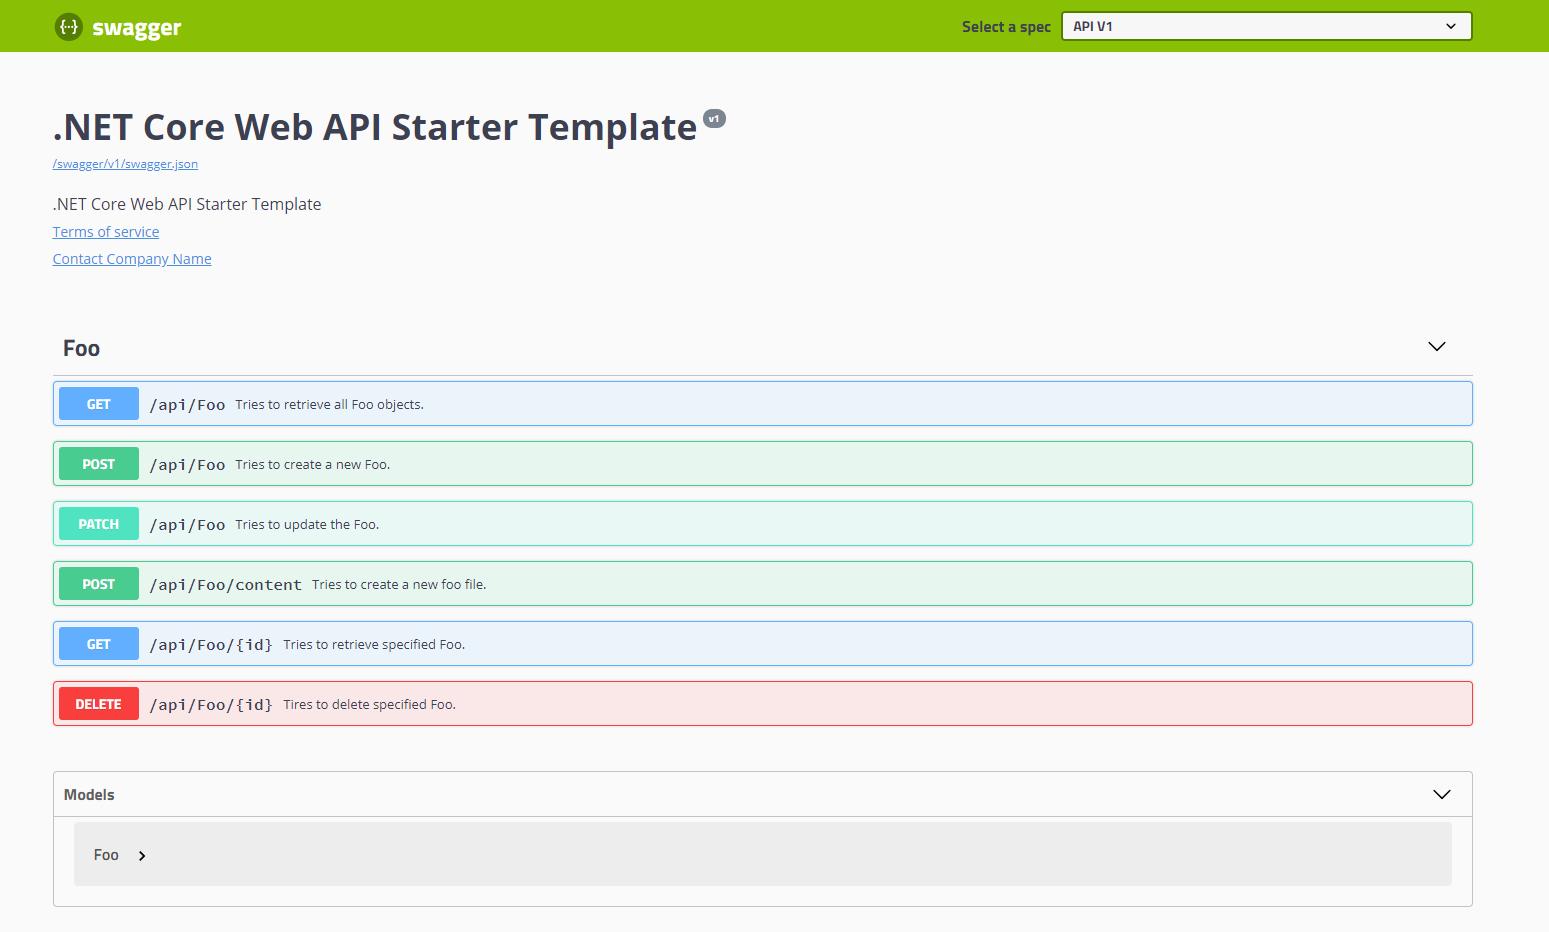 .NET Core Web API Starter Template